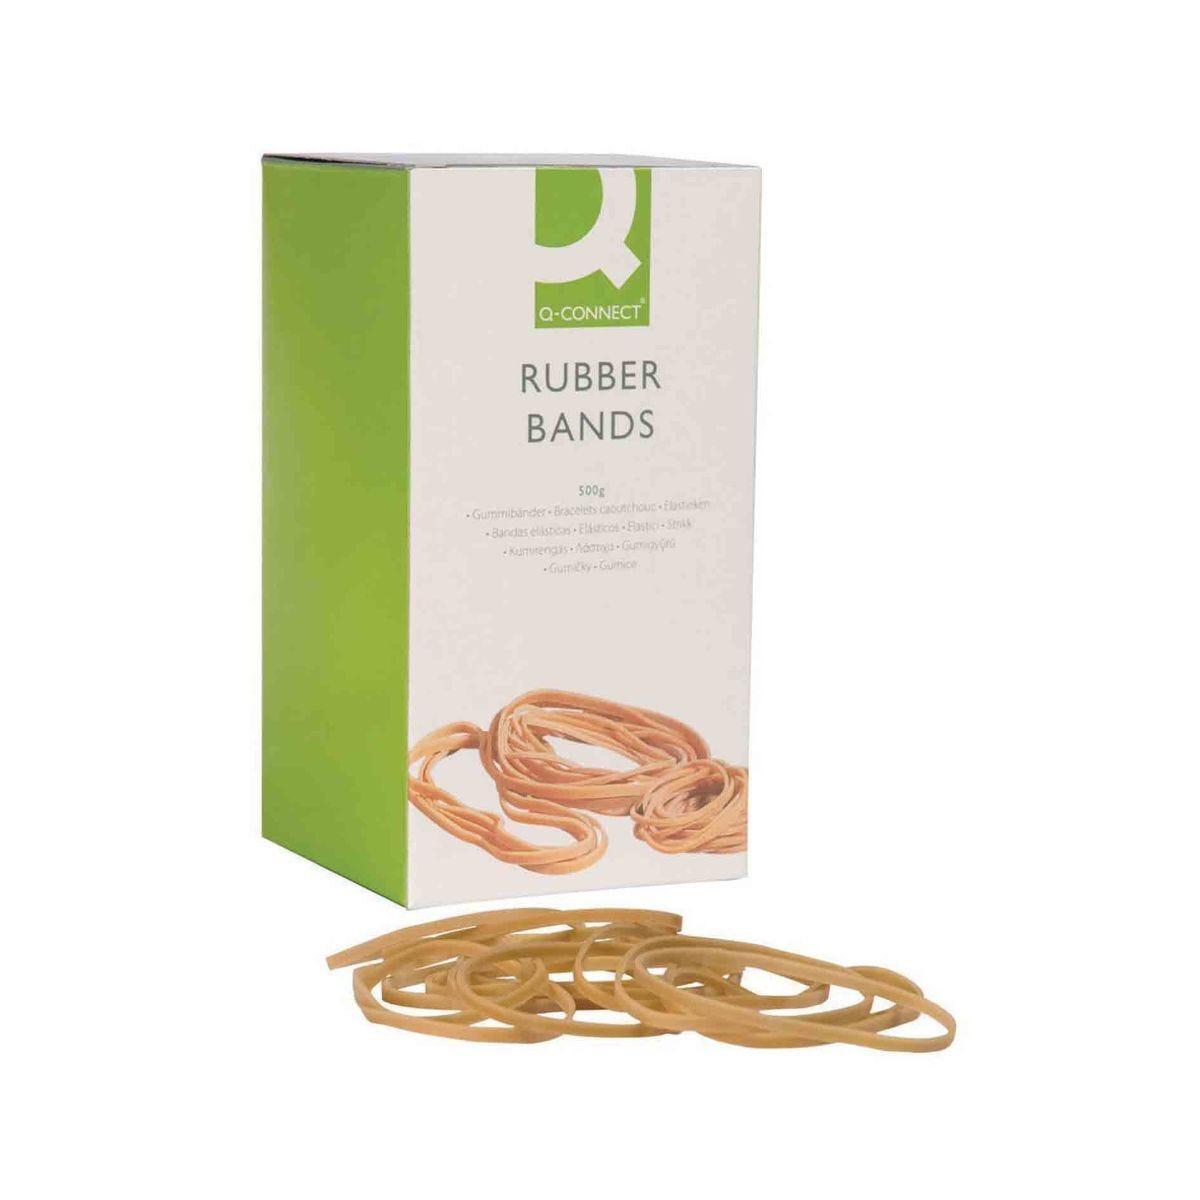 Q-Connect Rubber Bands No. 33 88.9 x 3.2mm 500g